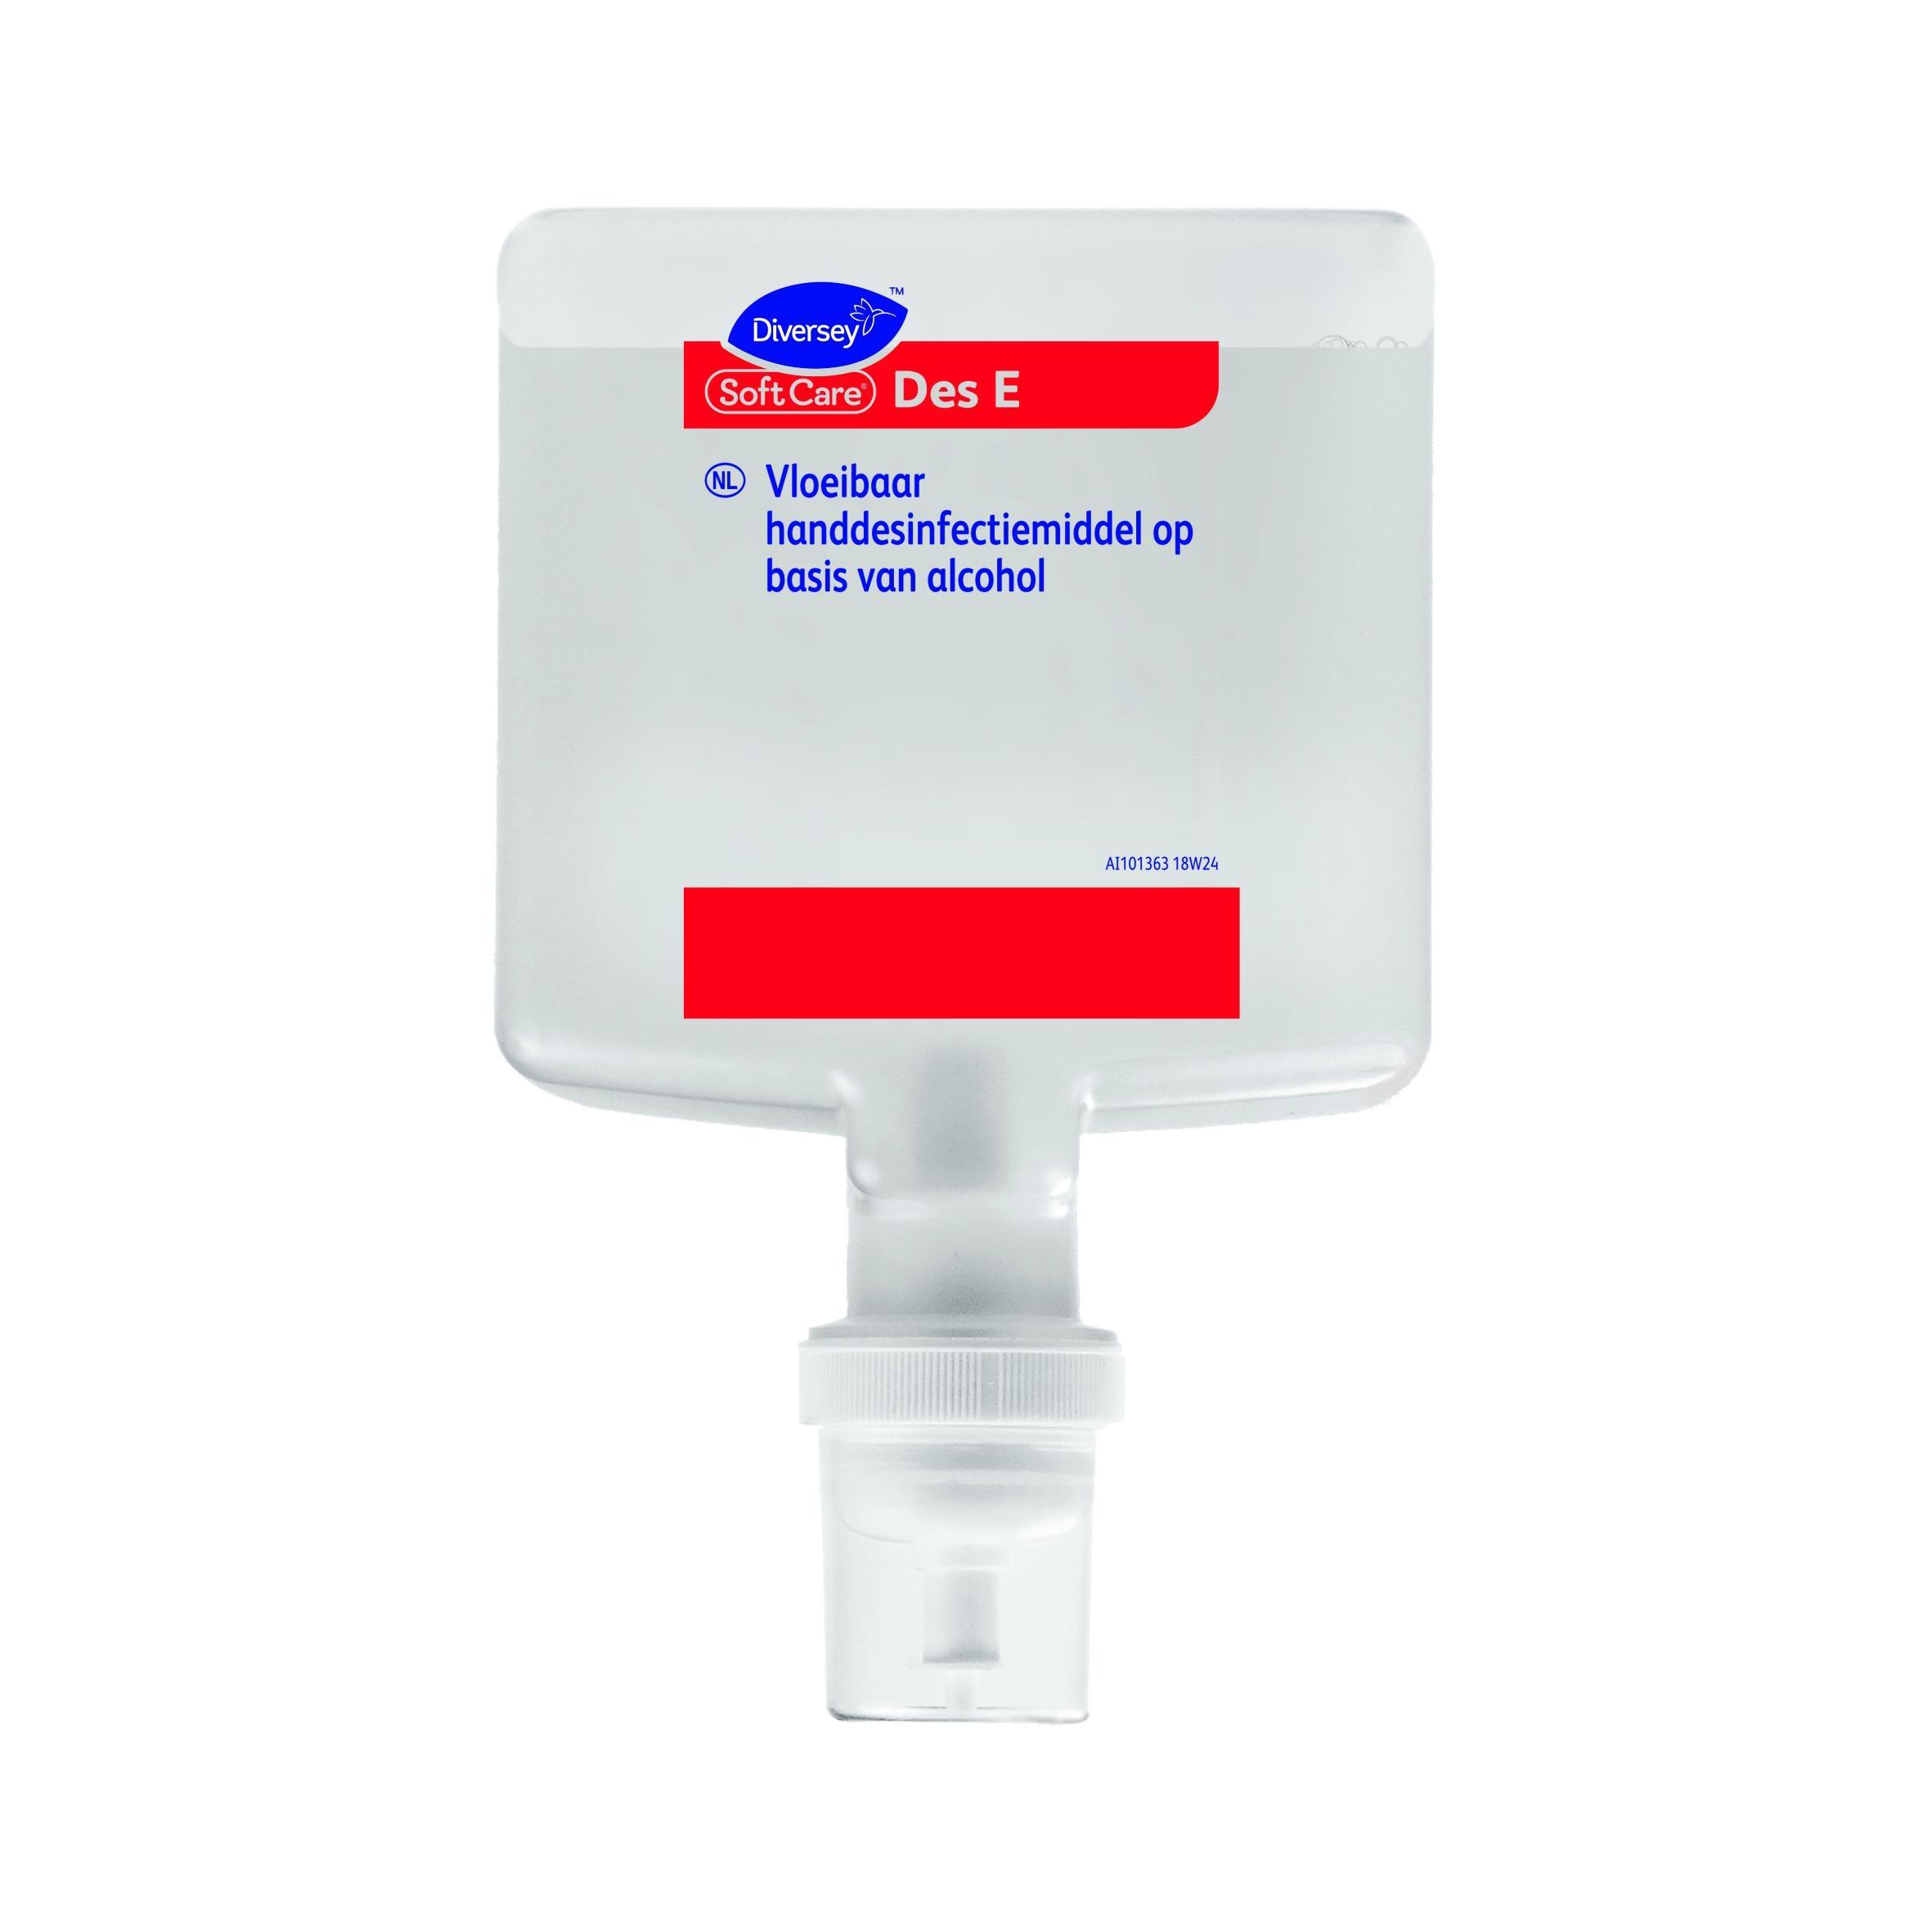 100962439-Soft-care-Des-E-1.3L-CMYK-20x20cm.jpg